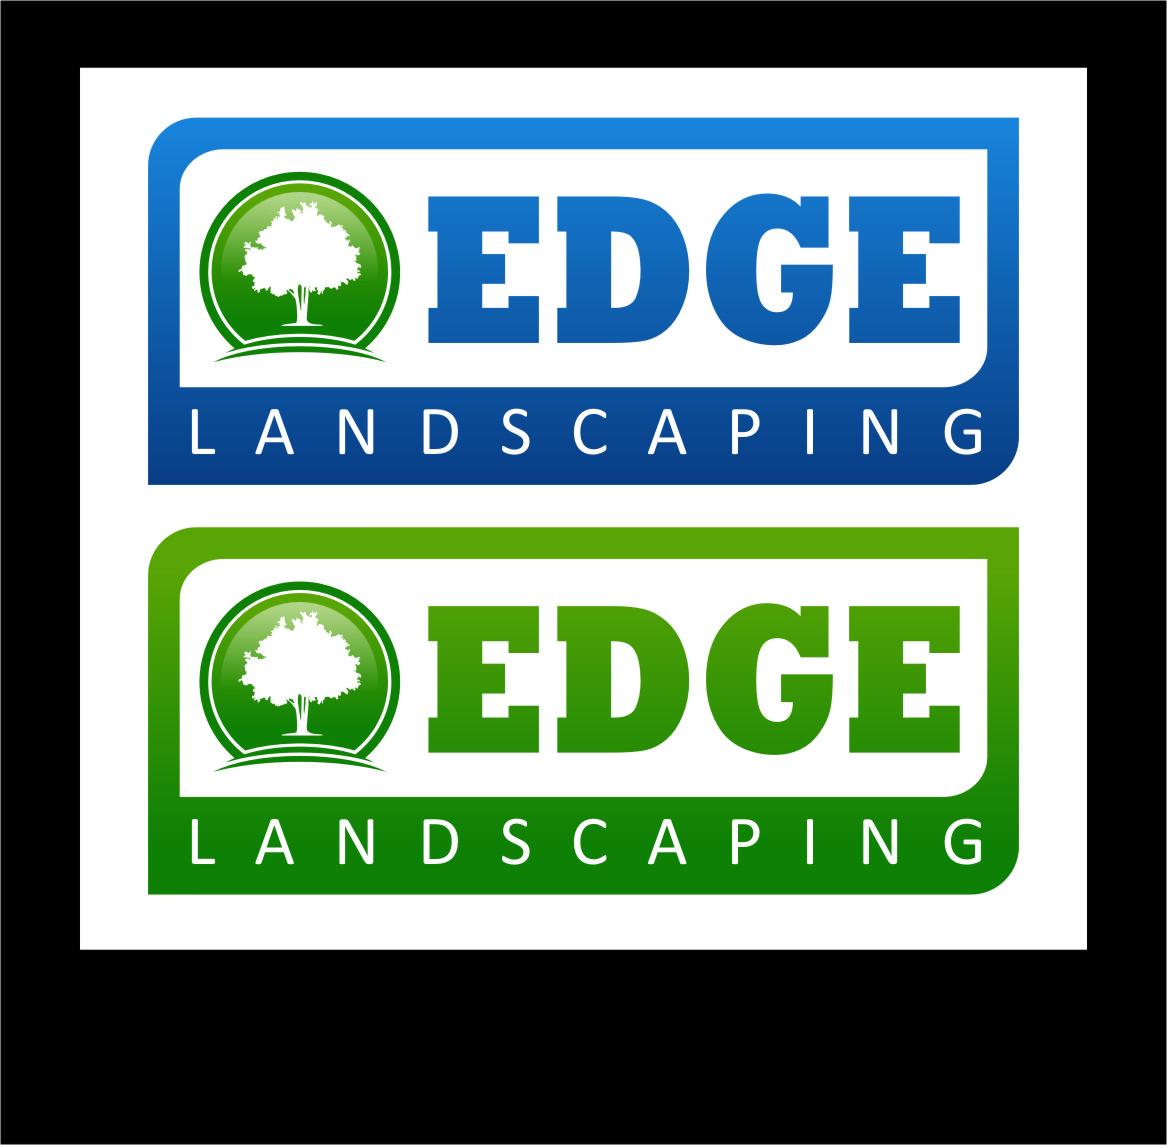 Logo Design by Ngepet_art - Entry No. 65 in the Logo Design Contest Inspiring Logo Design for Edge Landscaping.